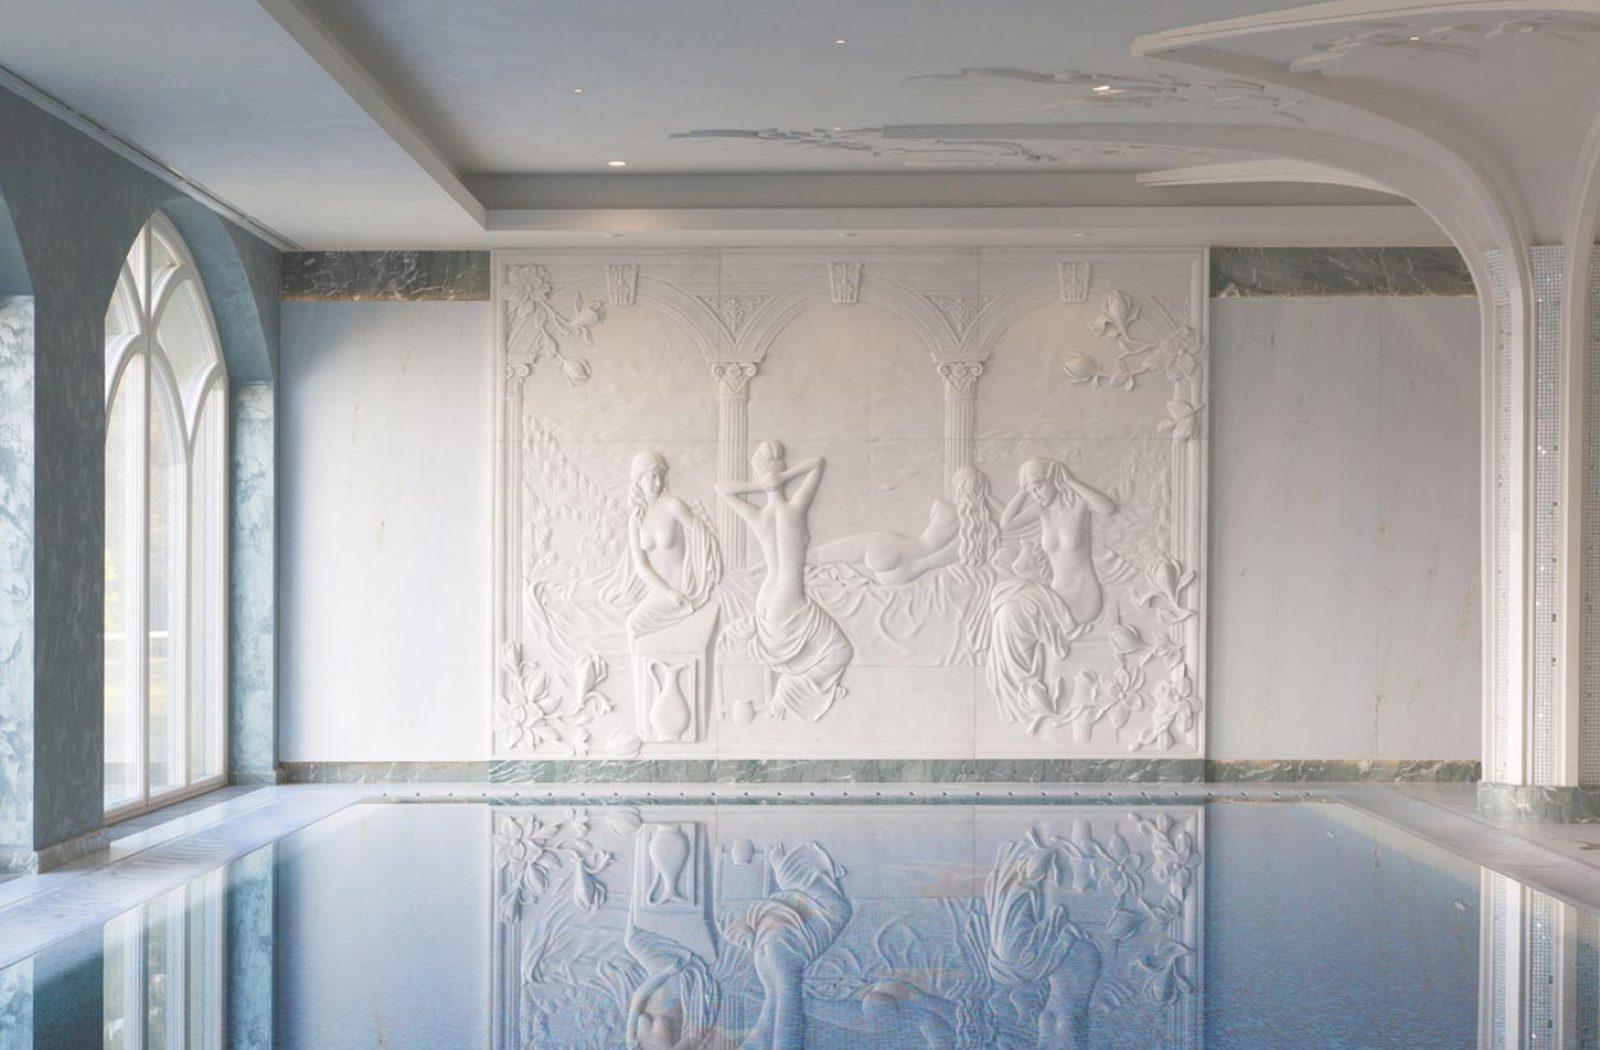 piscine verbano - la magia del mosaico (5)